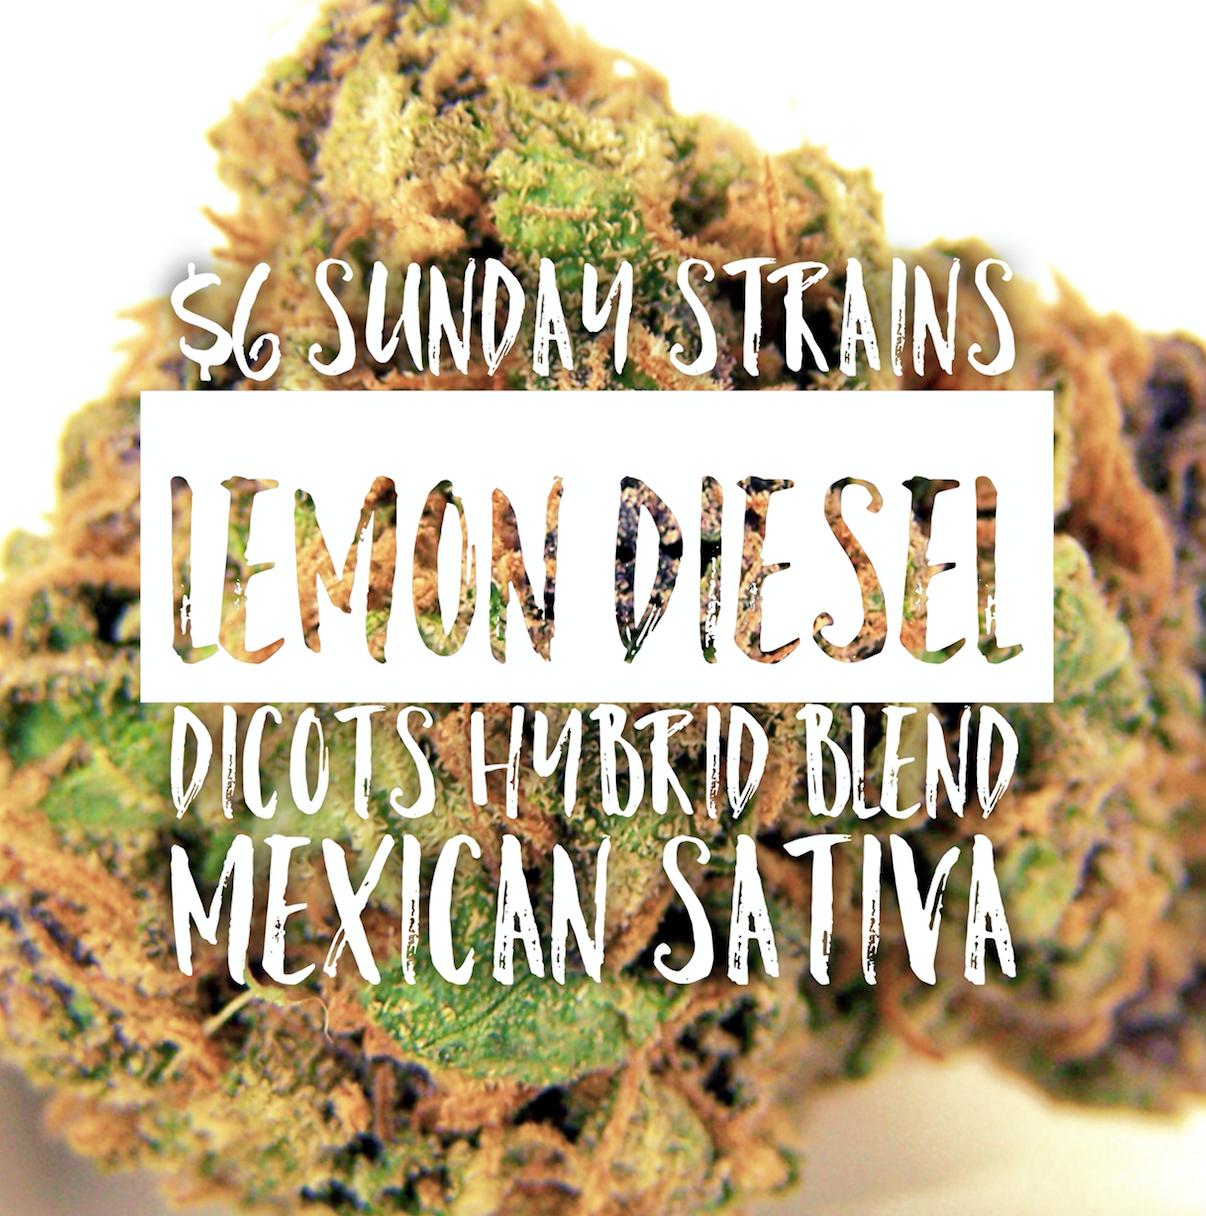 Lemon-Diesel-Indica-Dicots-Hybrid-Blend-Hybrid-Mexican-Sativa